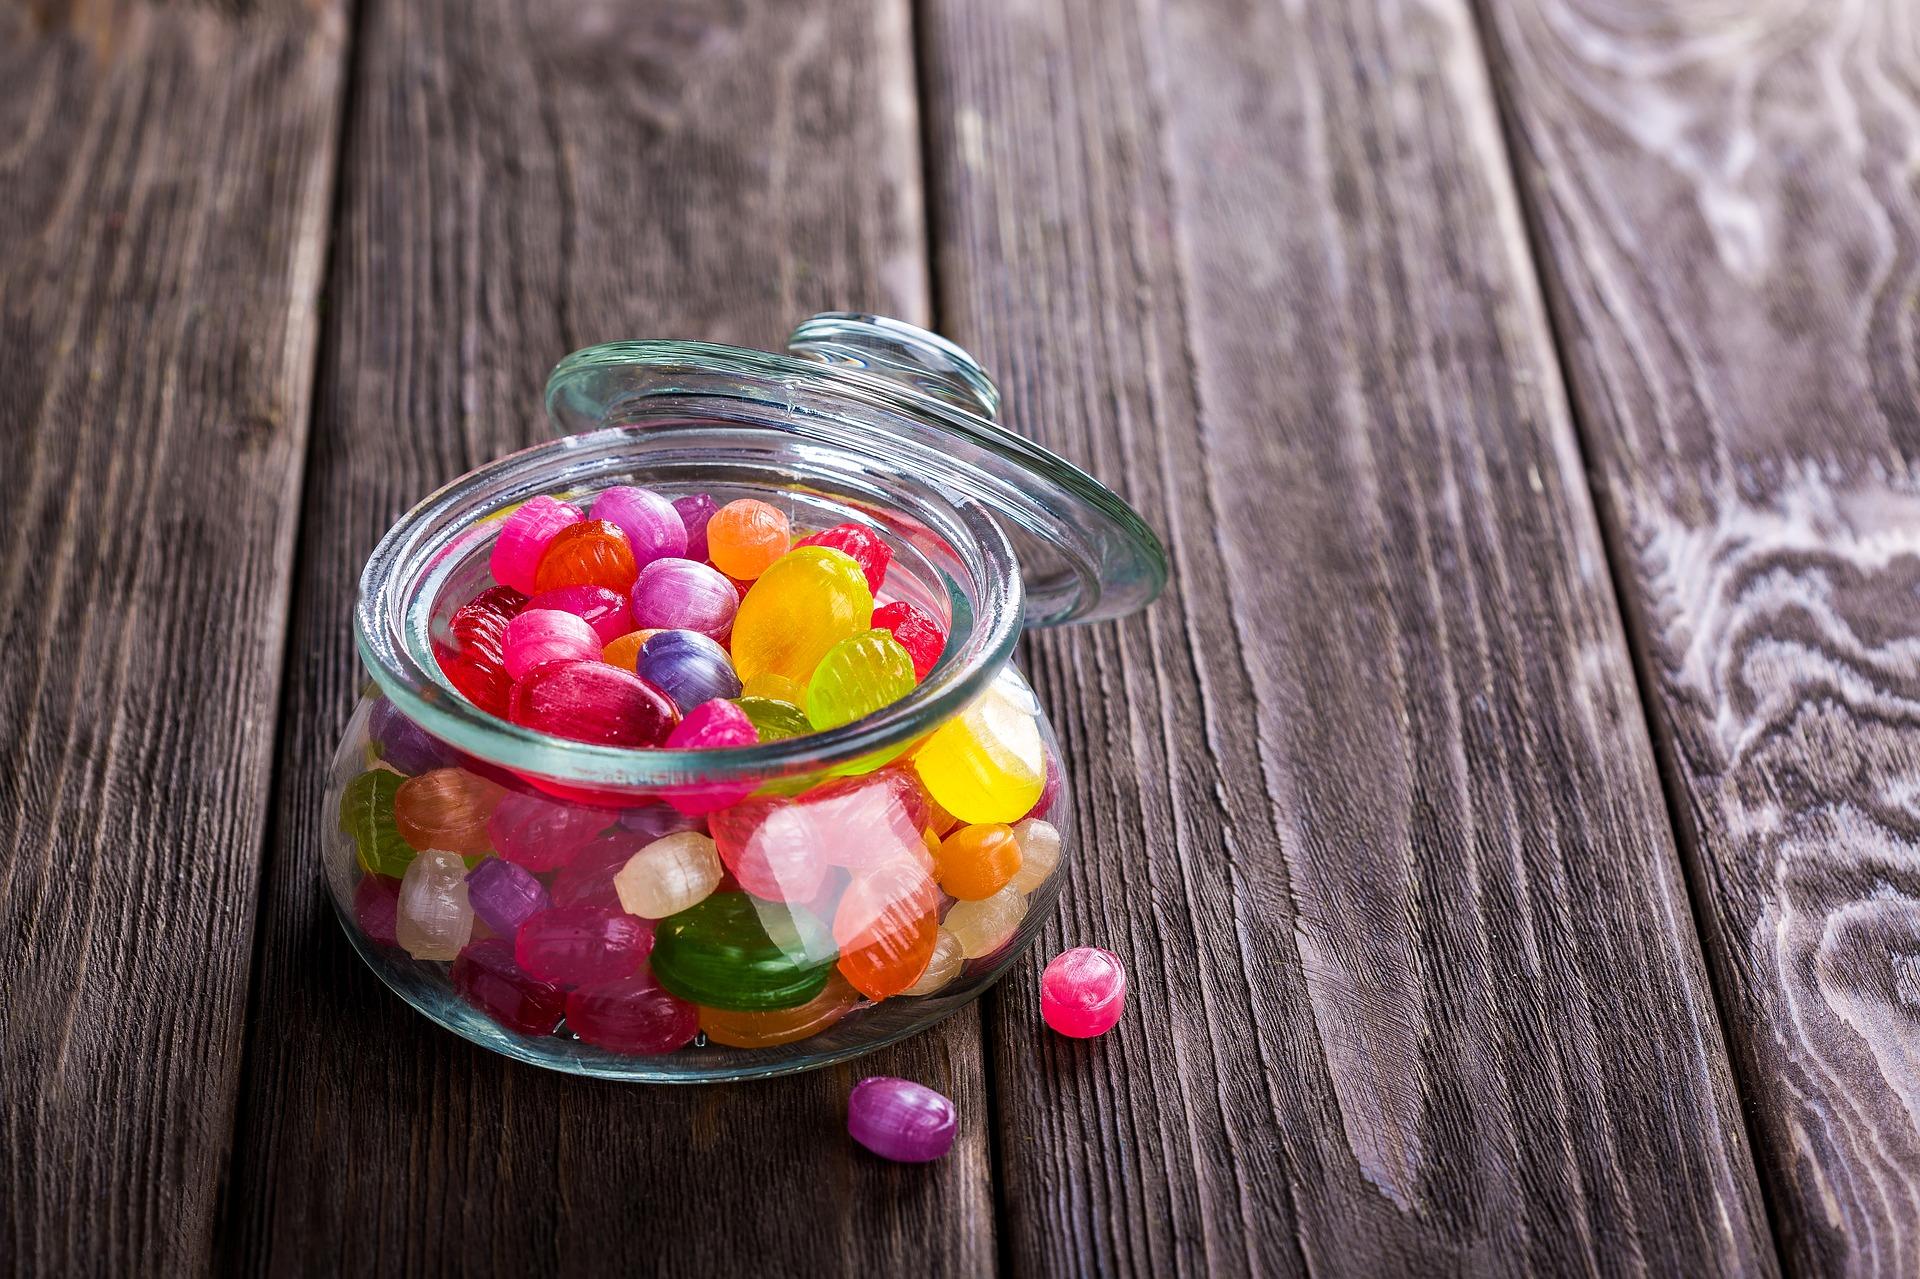 Candies in a jar photo